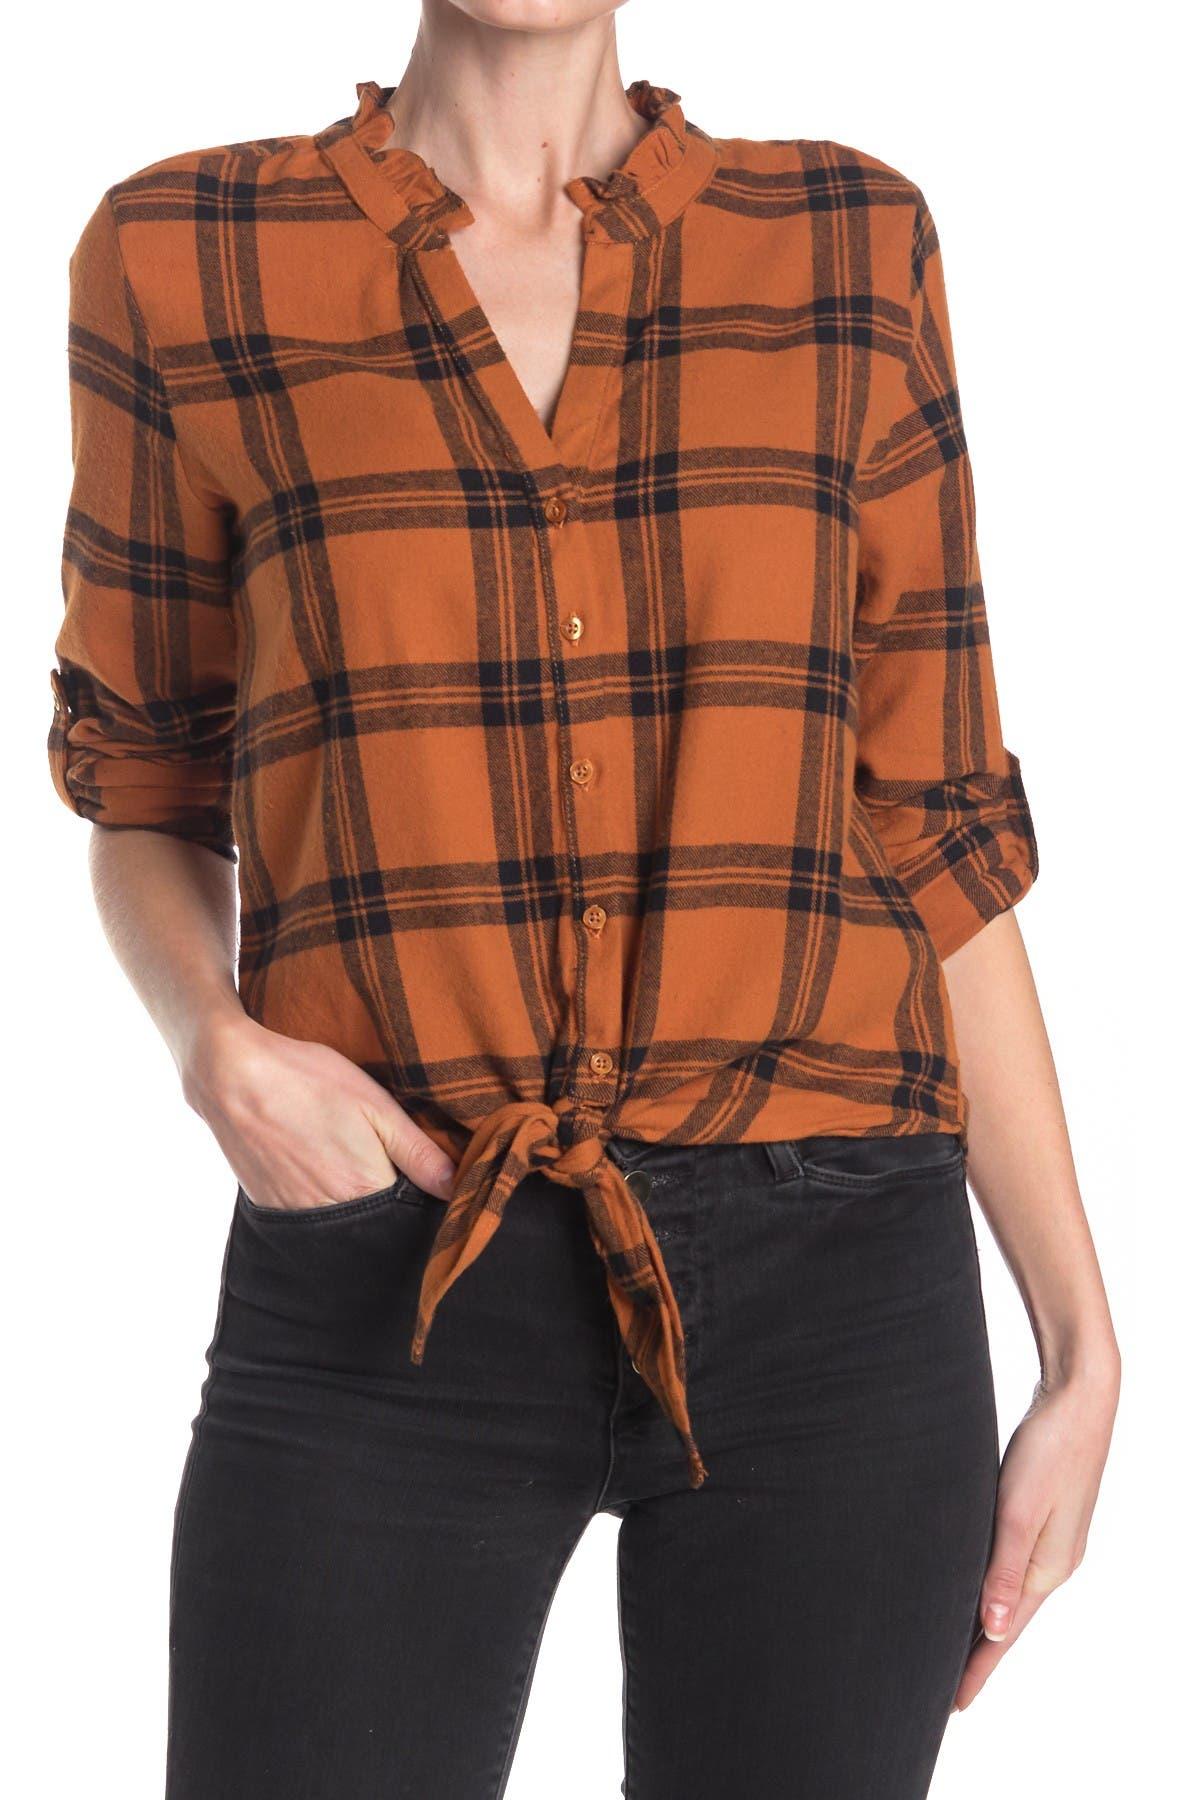 Image of Harve Benard Plaid Front Tie Flannel Shirt